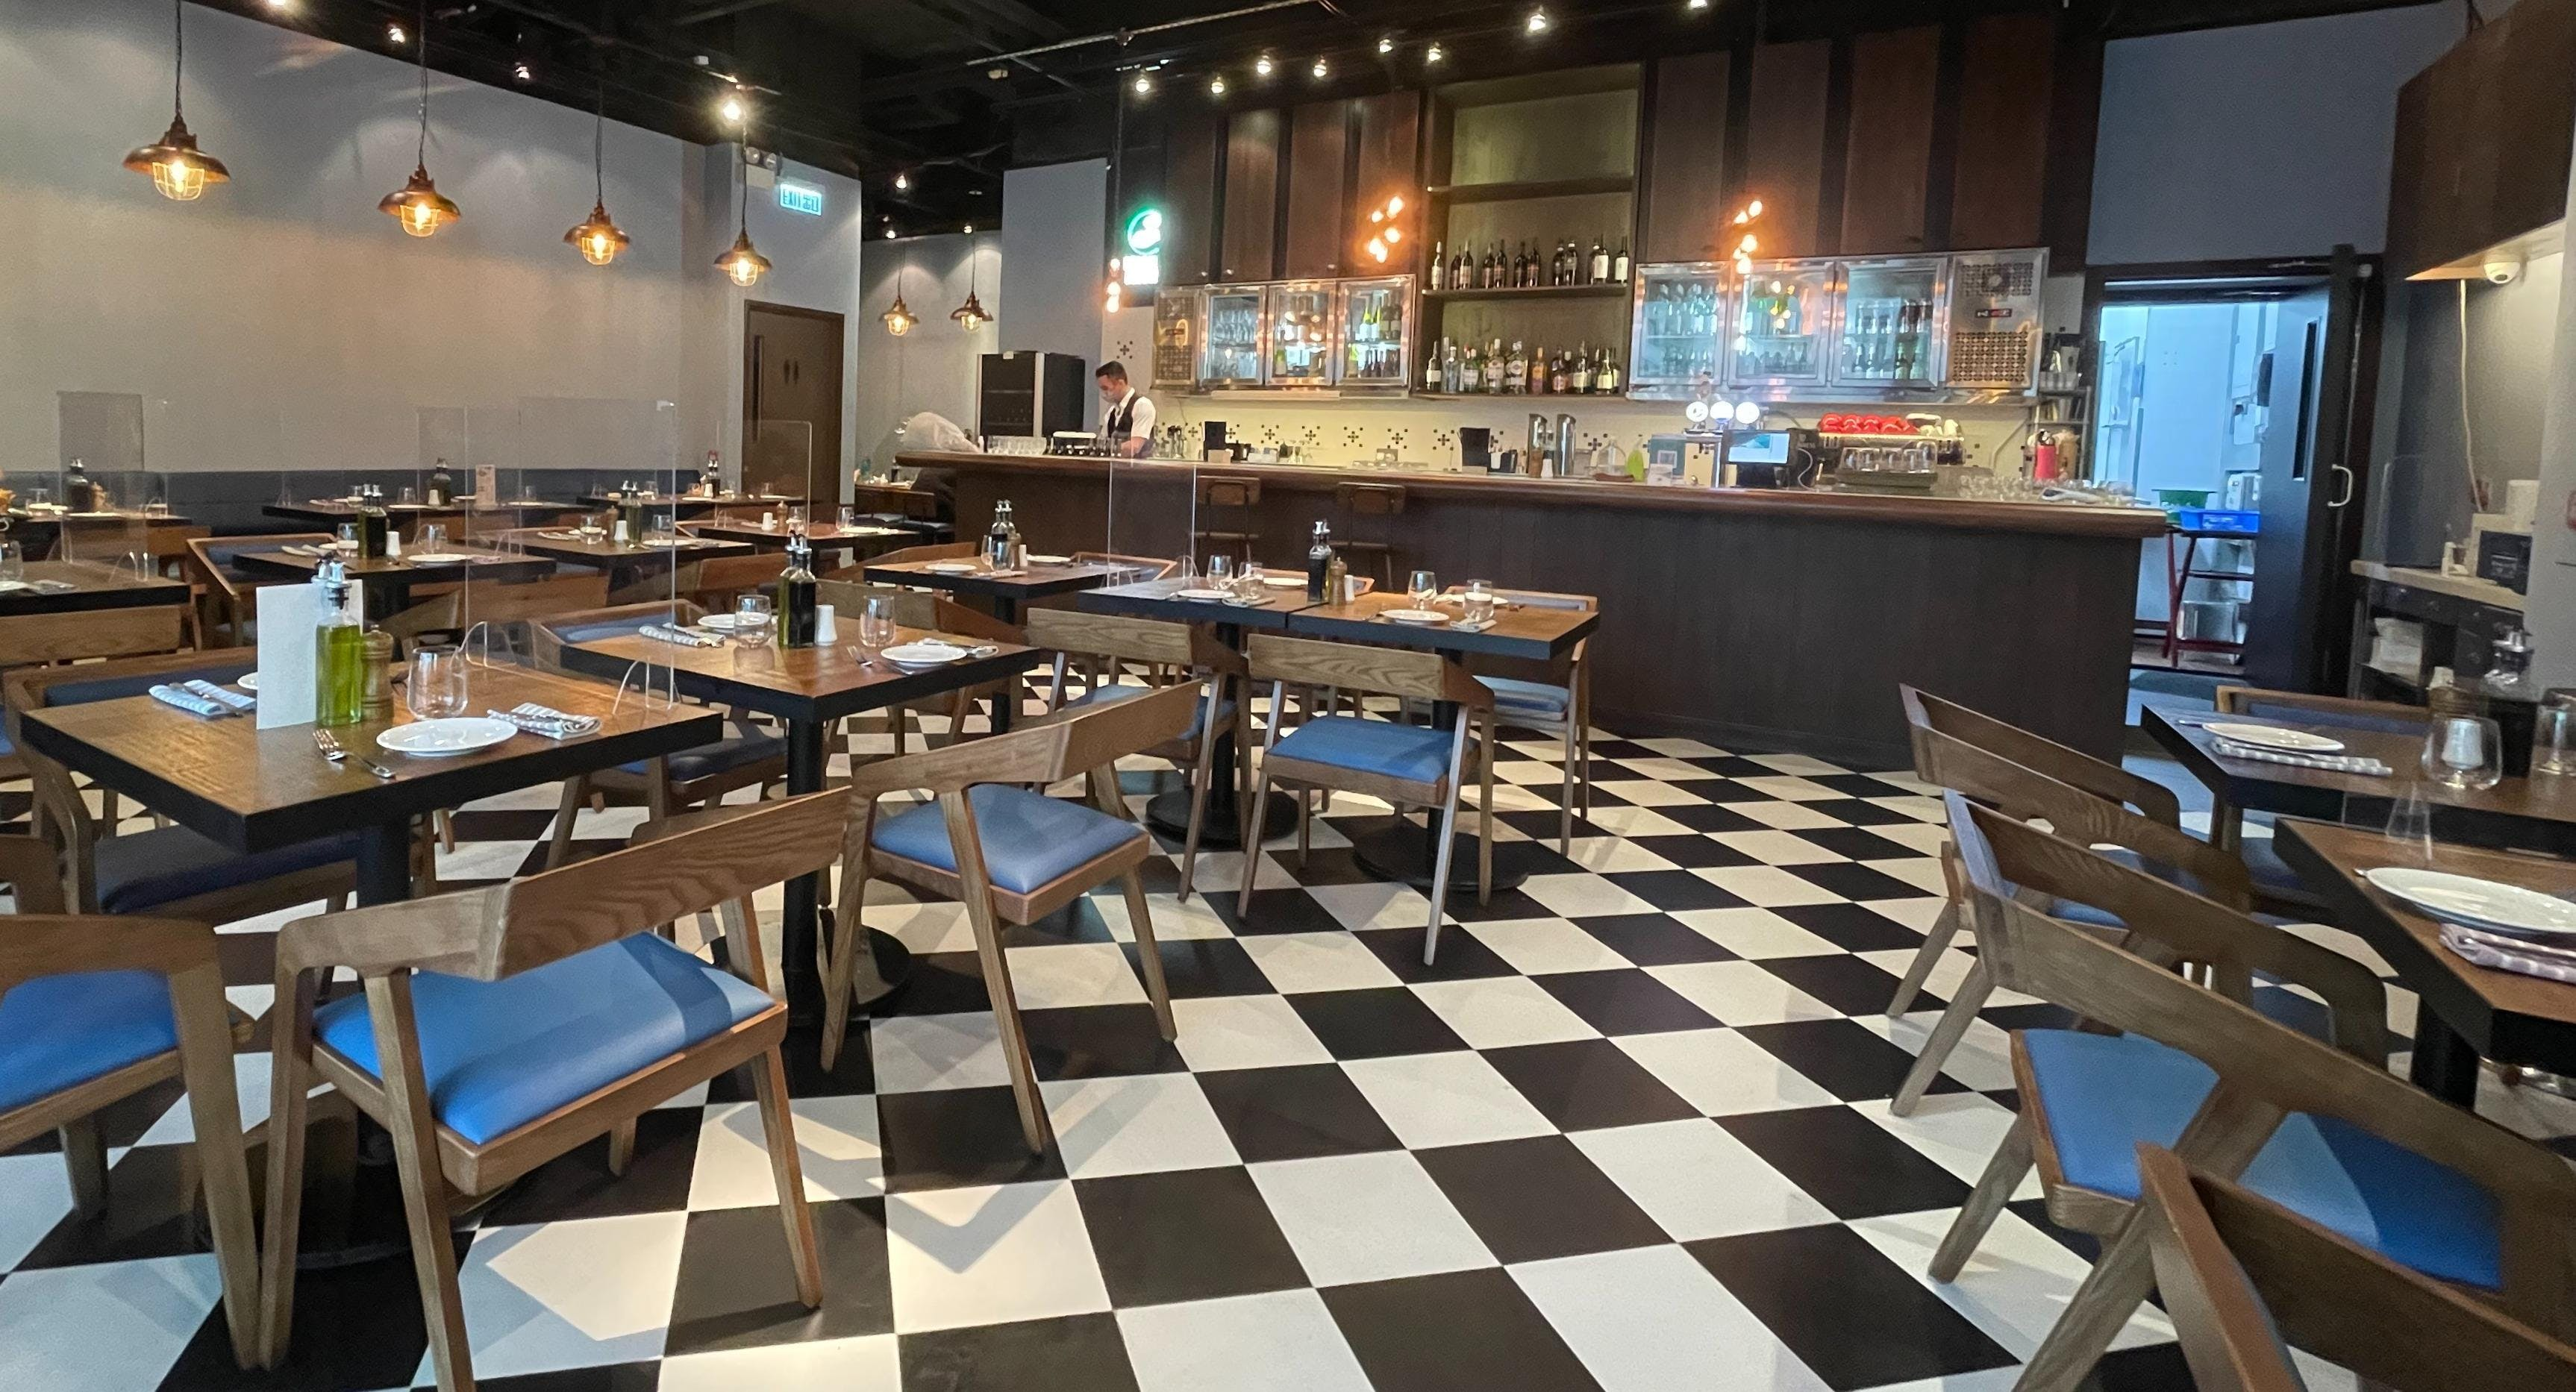 Photo of restaurant B&L - Burger and Lobster in Wan Chai, Hong Kong